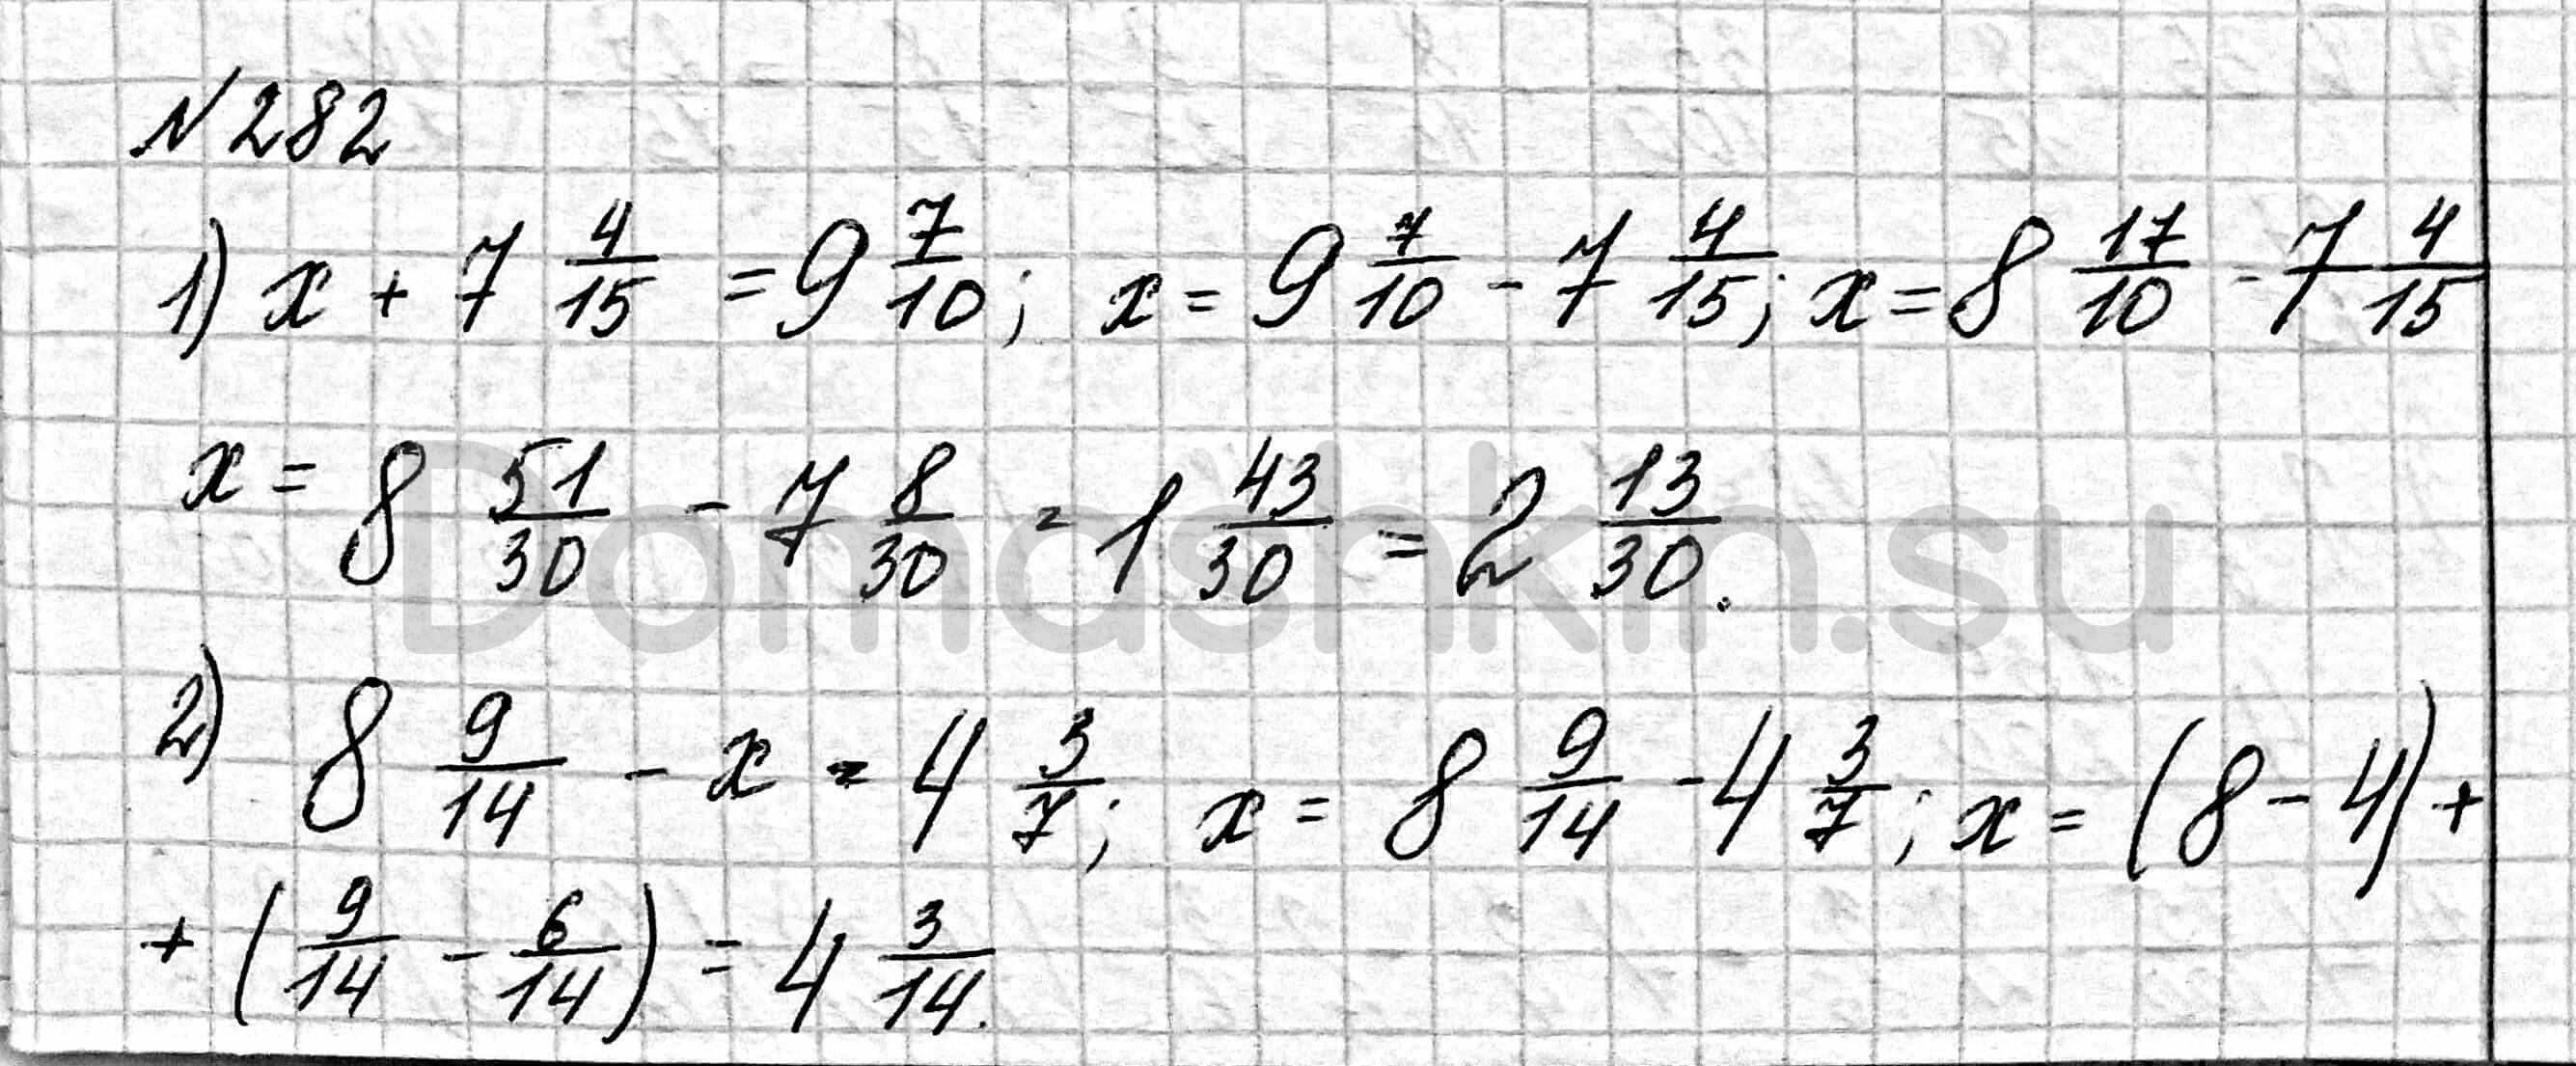 Математика 6 класс учебник Мерзляк номер 282 решение